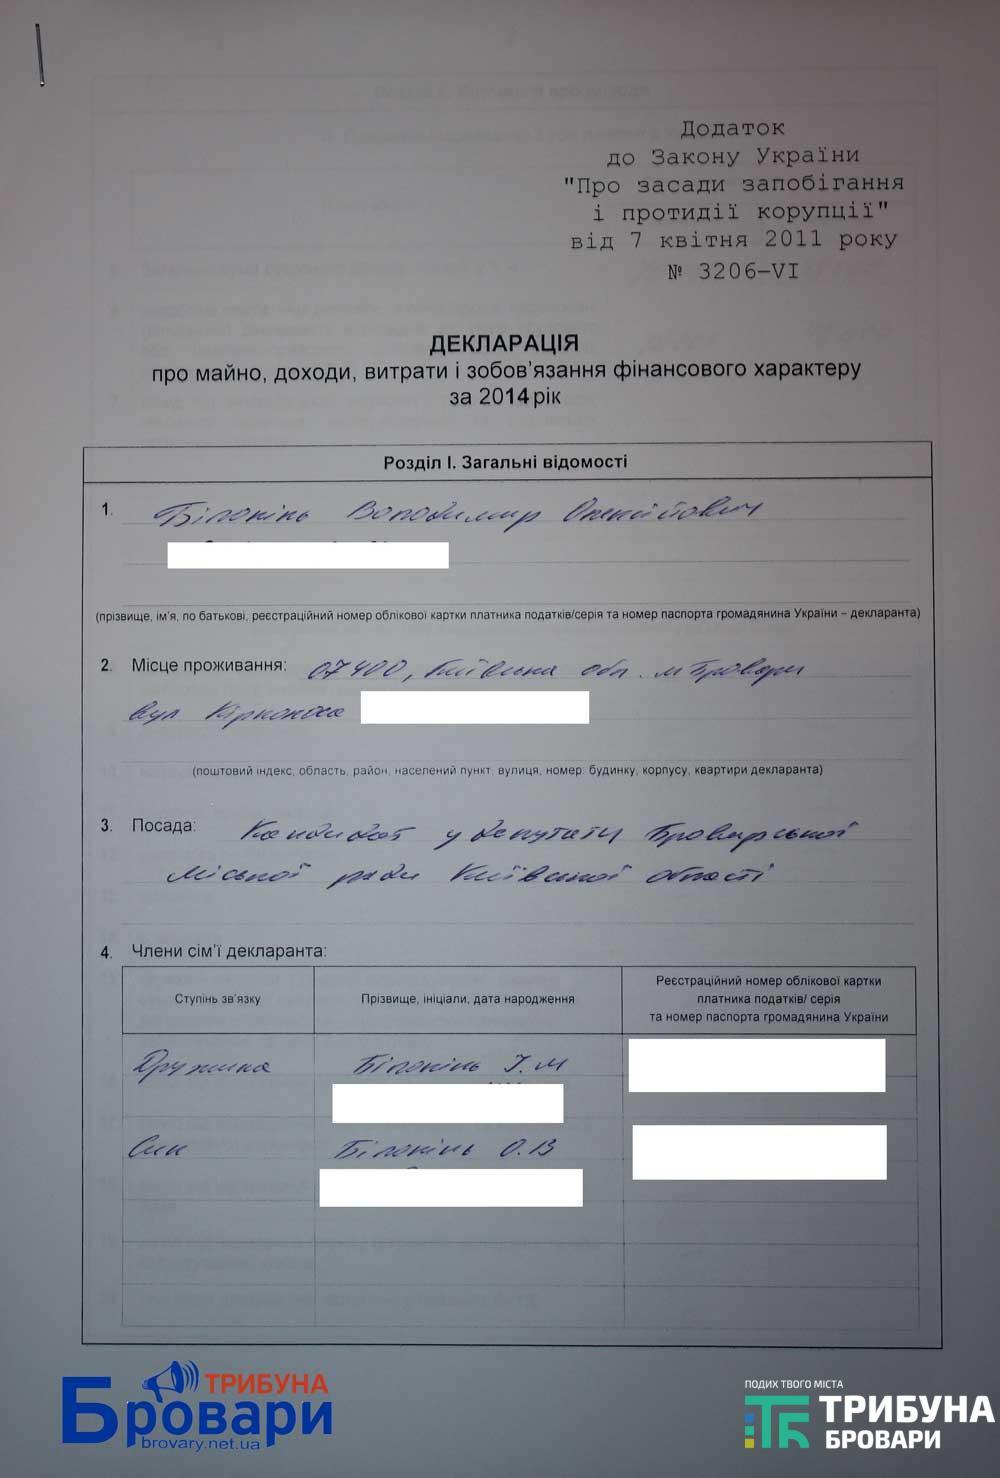 Bilokonj_02